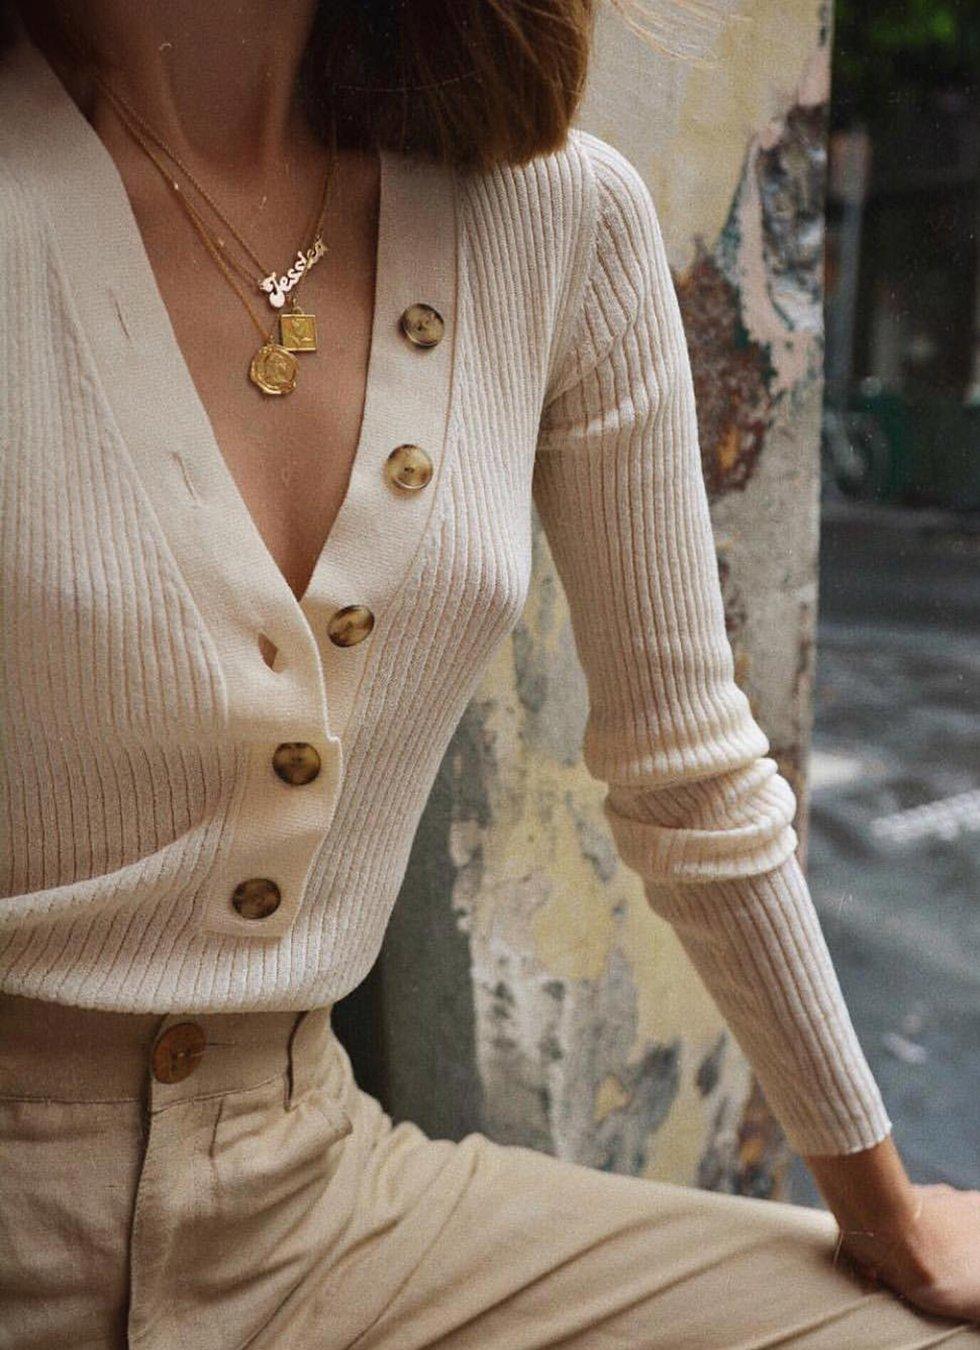 goldjewelry13